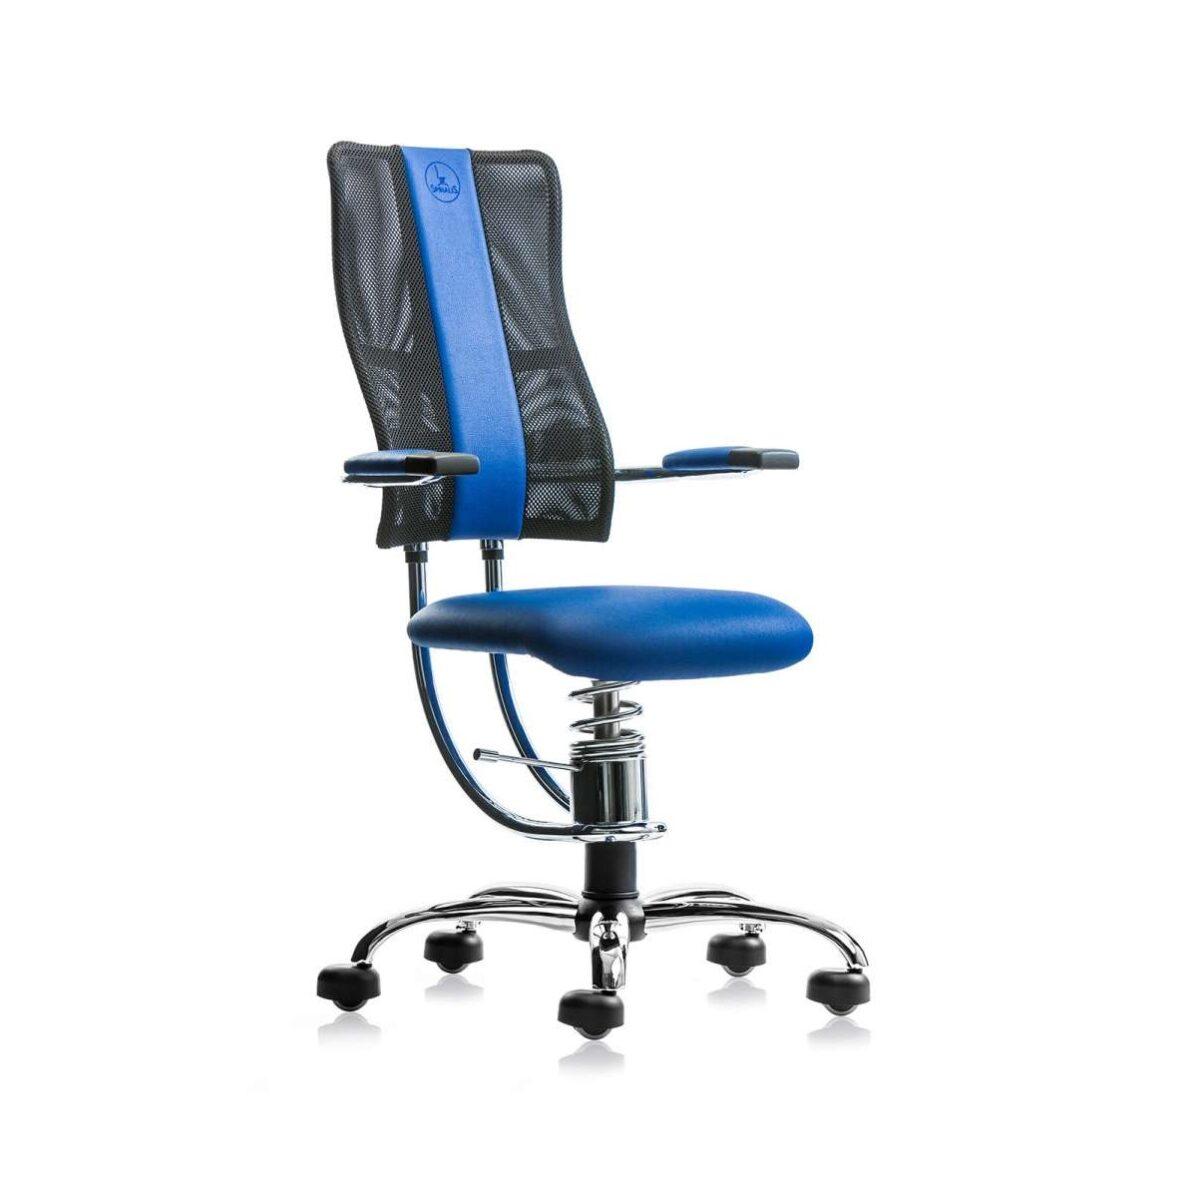 scaun ergonomic albastru